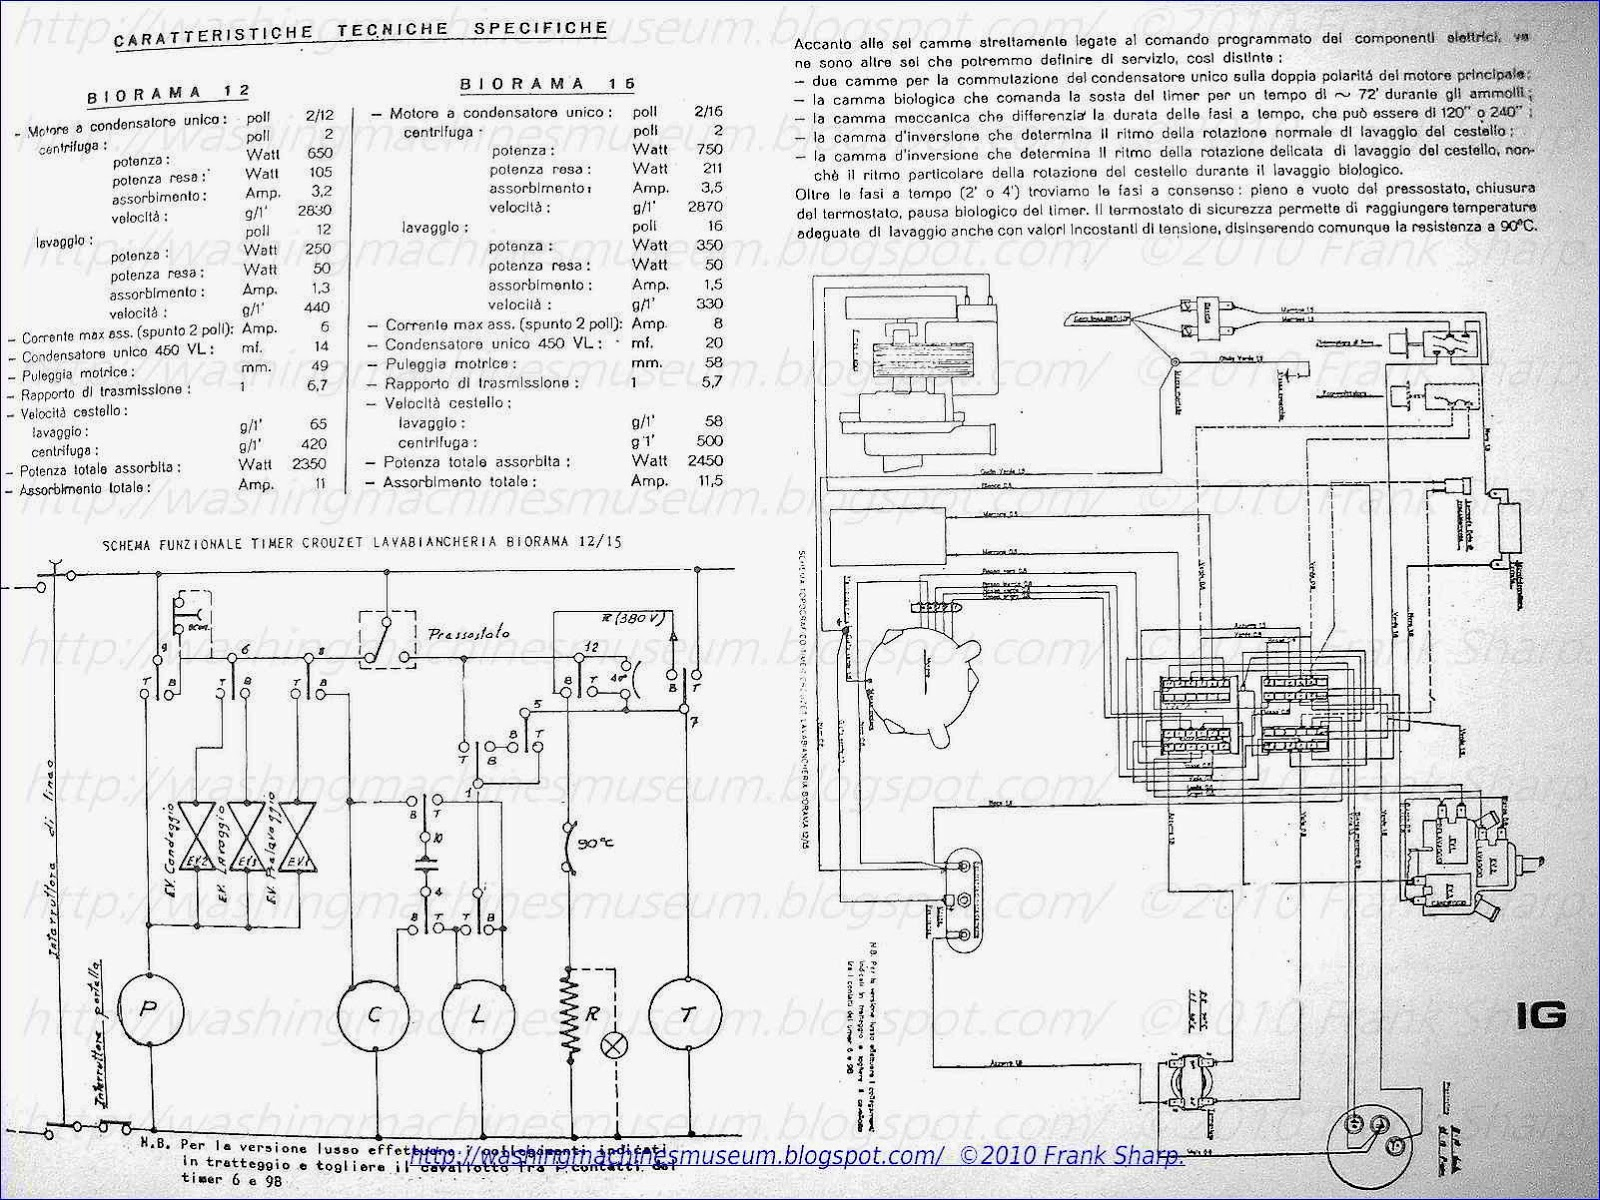 For Stove Schematic Wiring Diagram Washer Rama Museum Ariston Merloni Mod Biorama 12 15